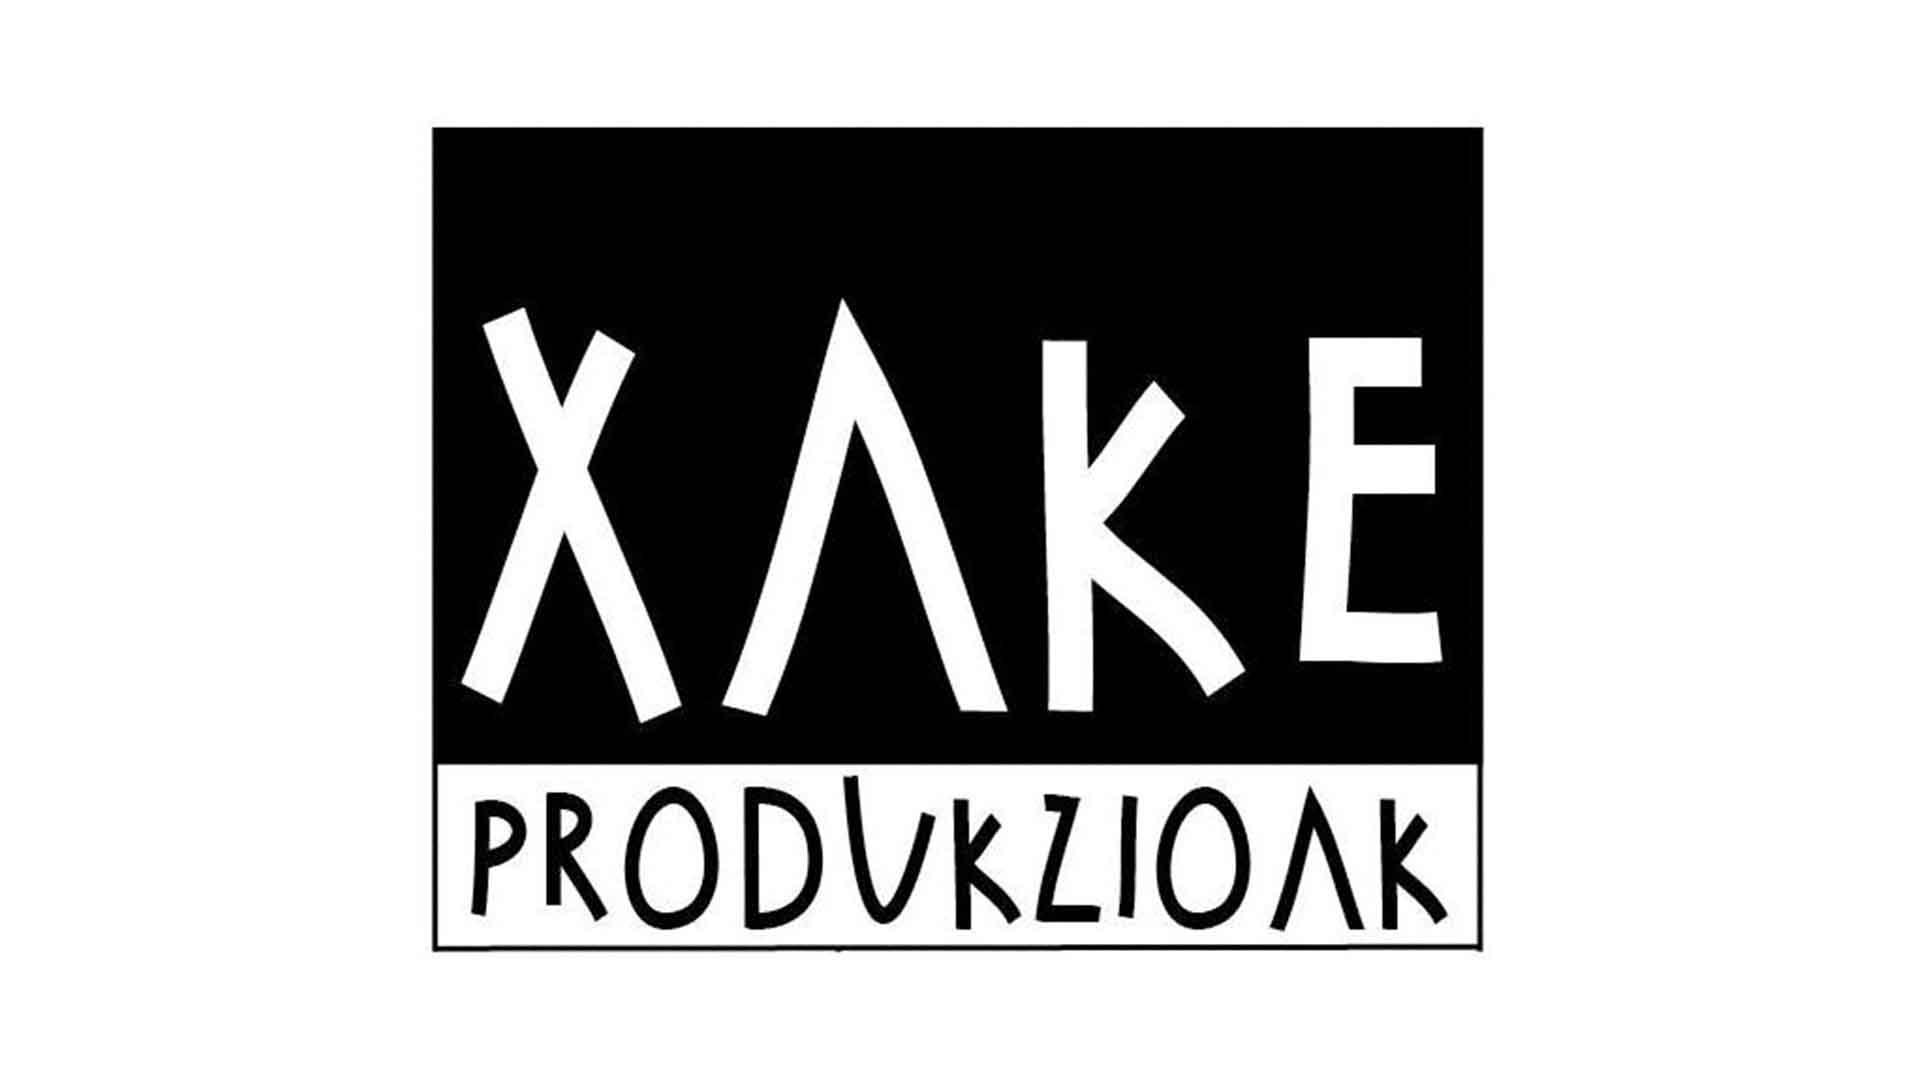 Xake Produkzioak (País Vasco)